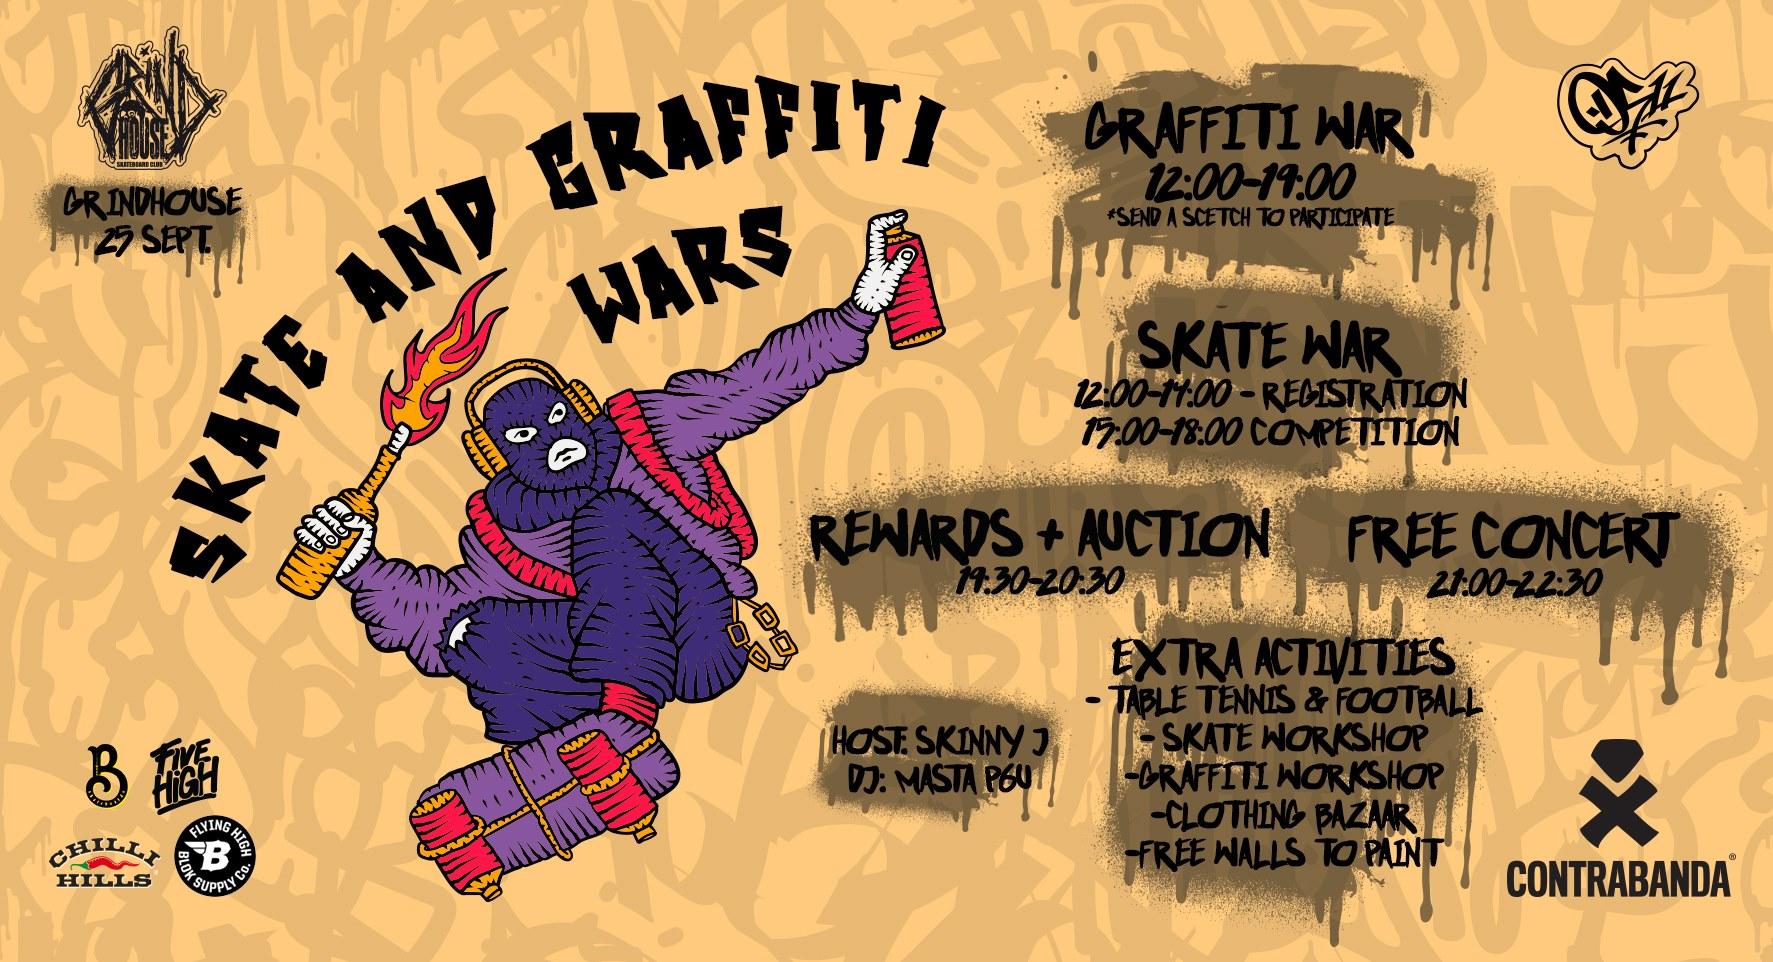 SKATE & GRAFFITI WARS